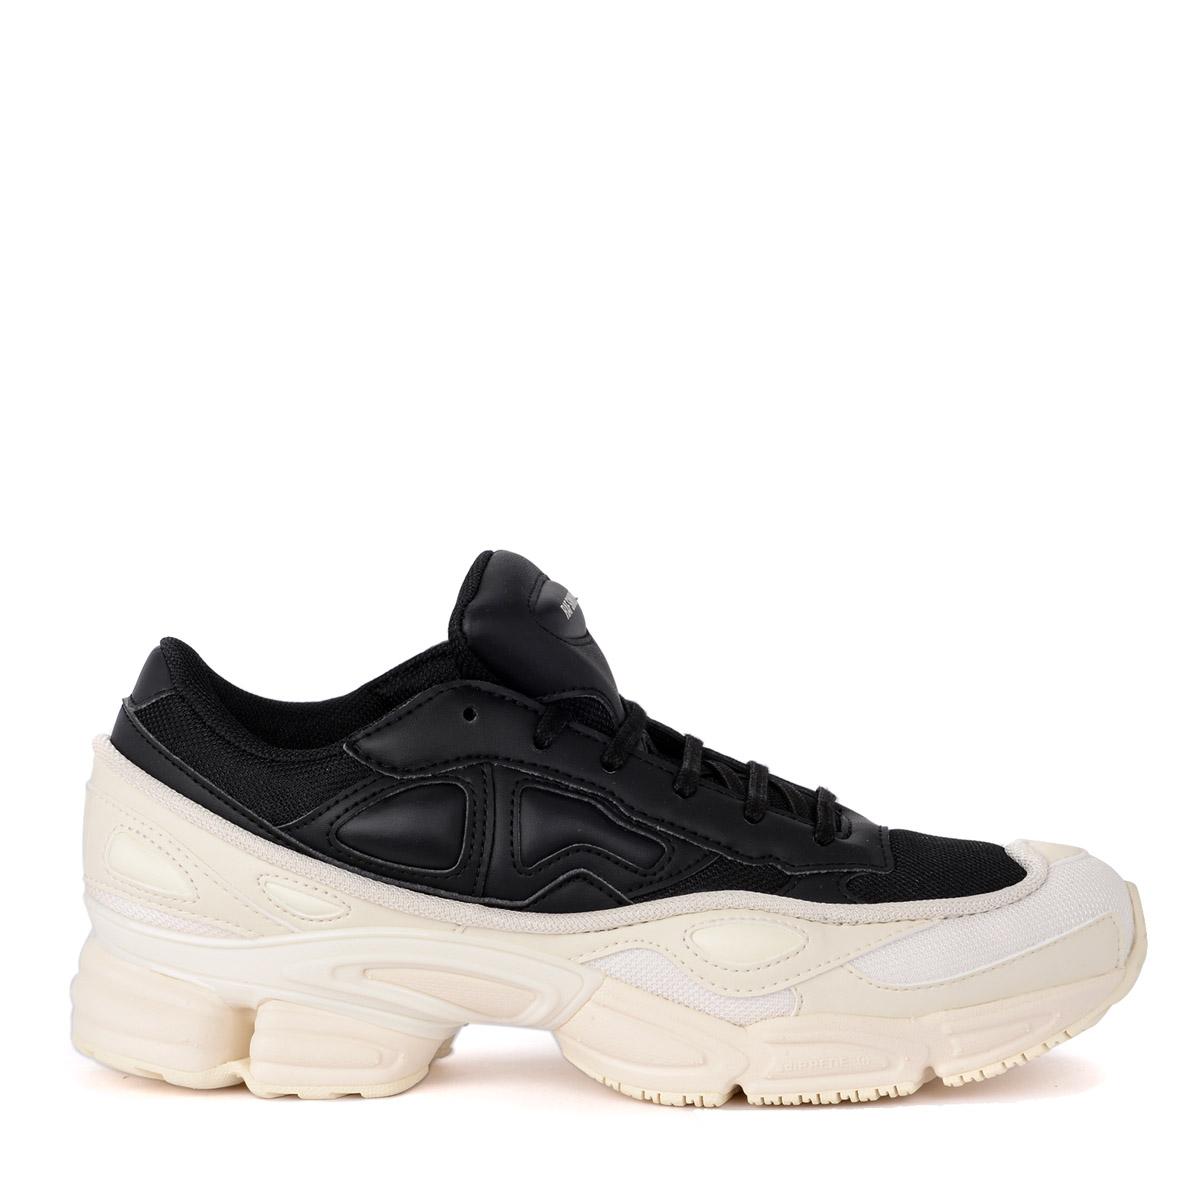 "cheaper d907c c704f Sneaker adidas by Raf Simons Ozweego in pelle e e e tessuto nera e bianca  62f6f0. """